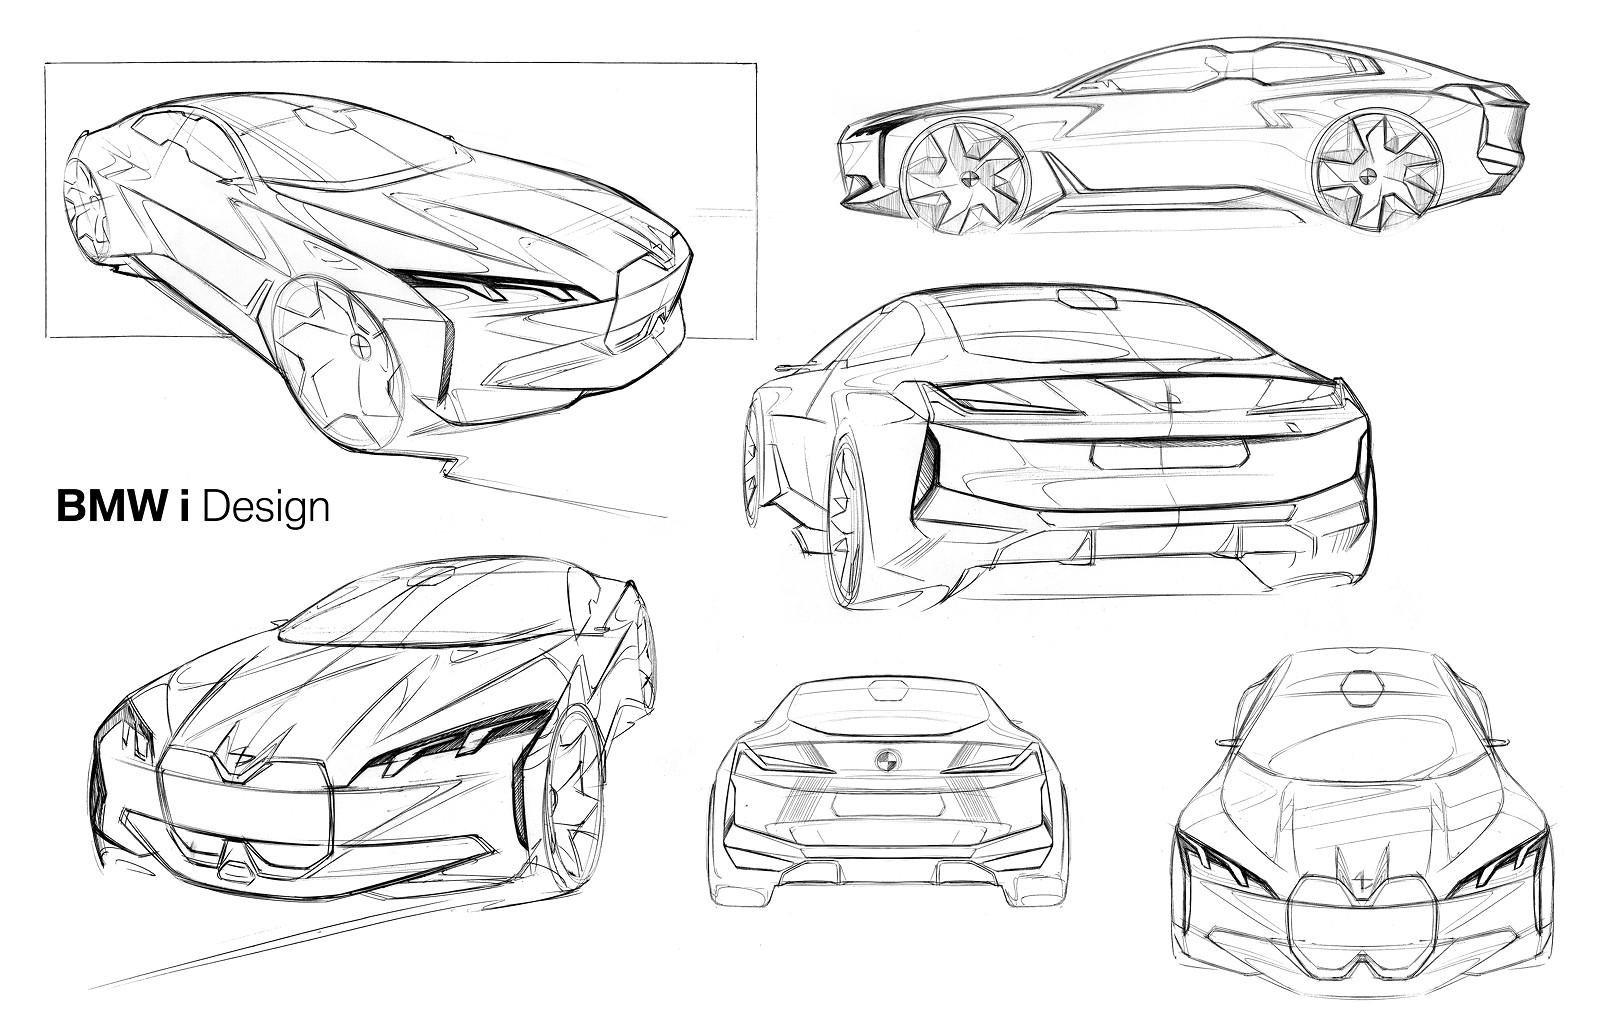 Foto: BMW i Vision Dynamics, Skizze (vergrößert)